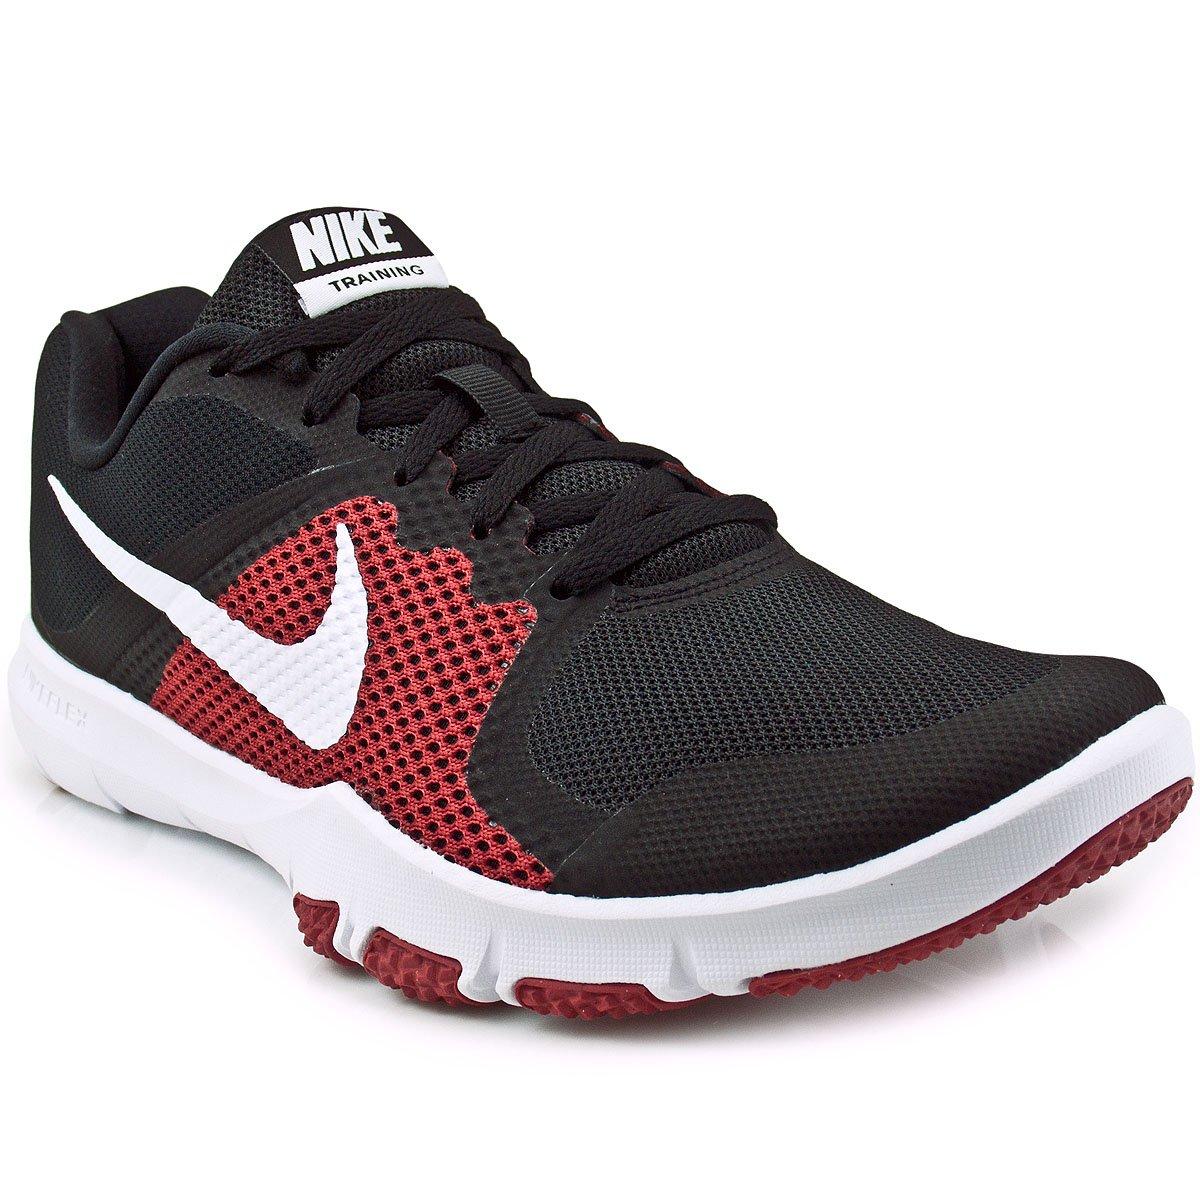 9656103ce65 Tênis Nike Flex Control 898459